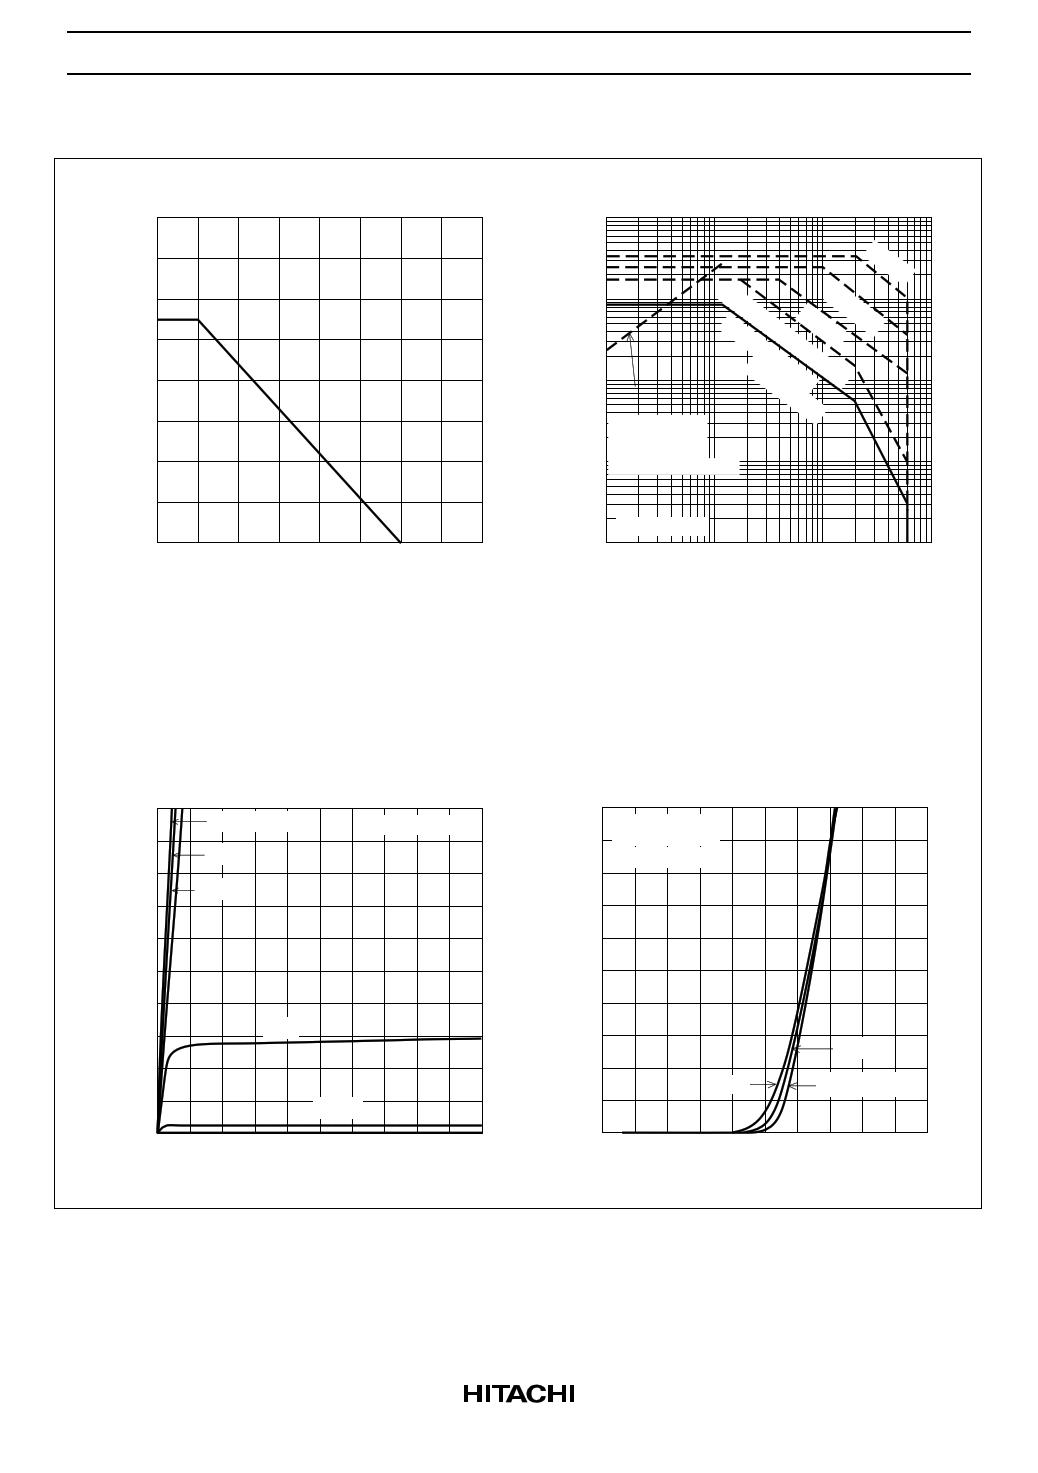 2SK3418 pdf, 반도체, 판매, 대치품